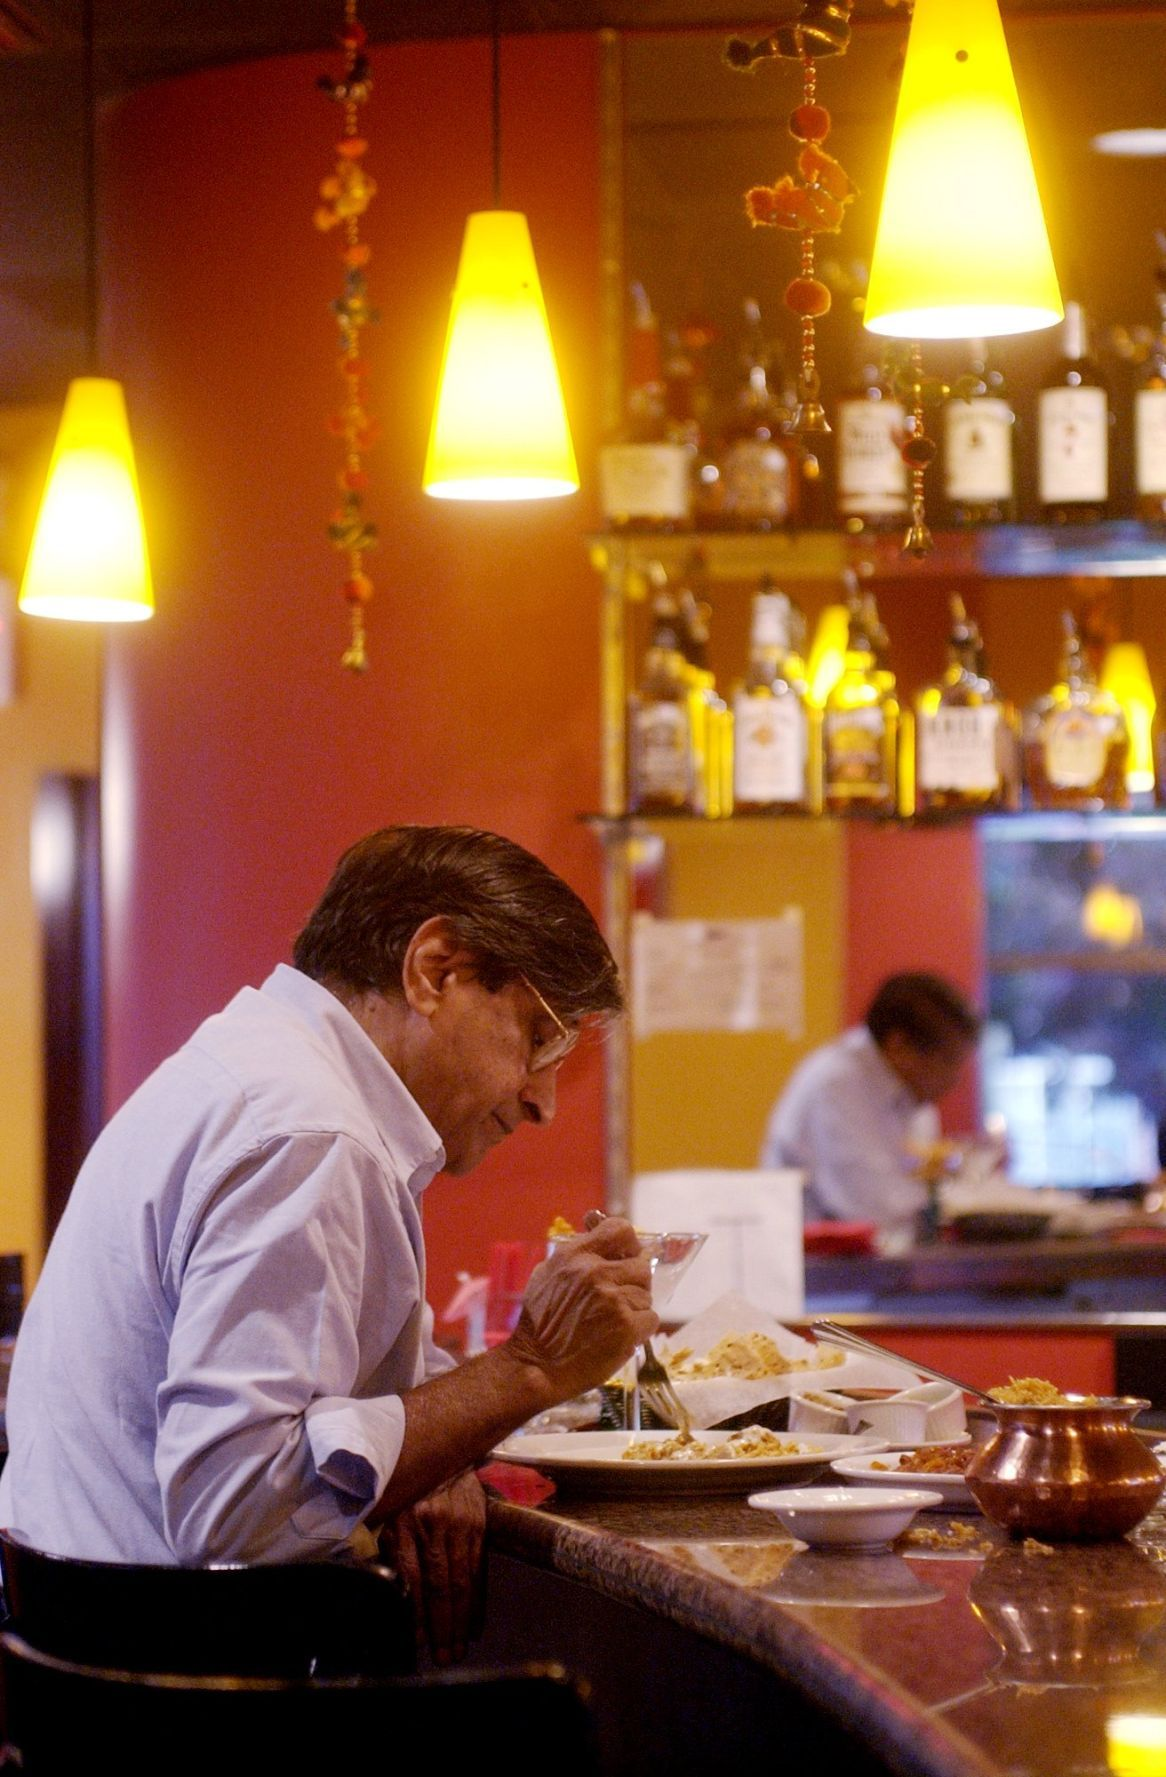 56e31ffdd0365.image Incroyable De Table Bar Cuisine Conception